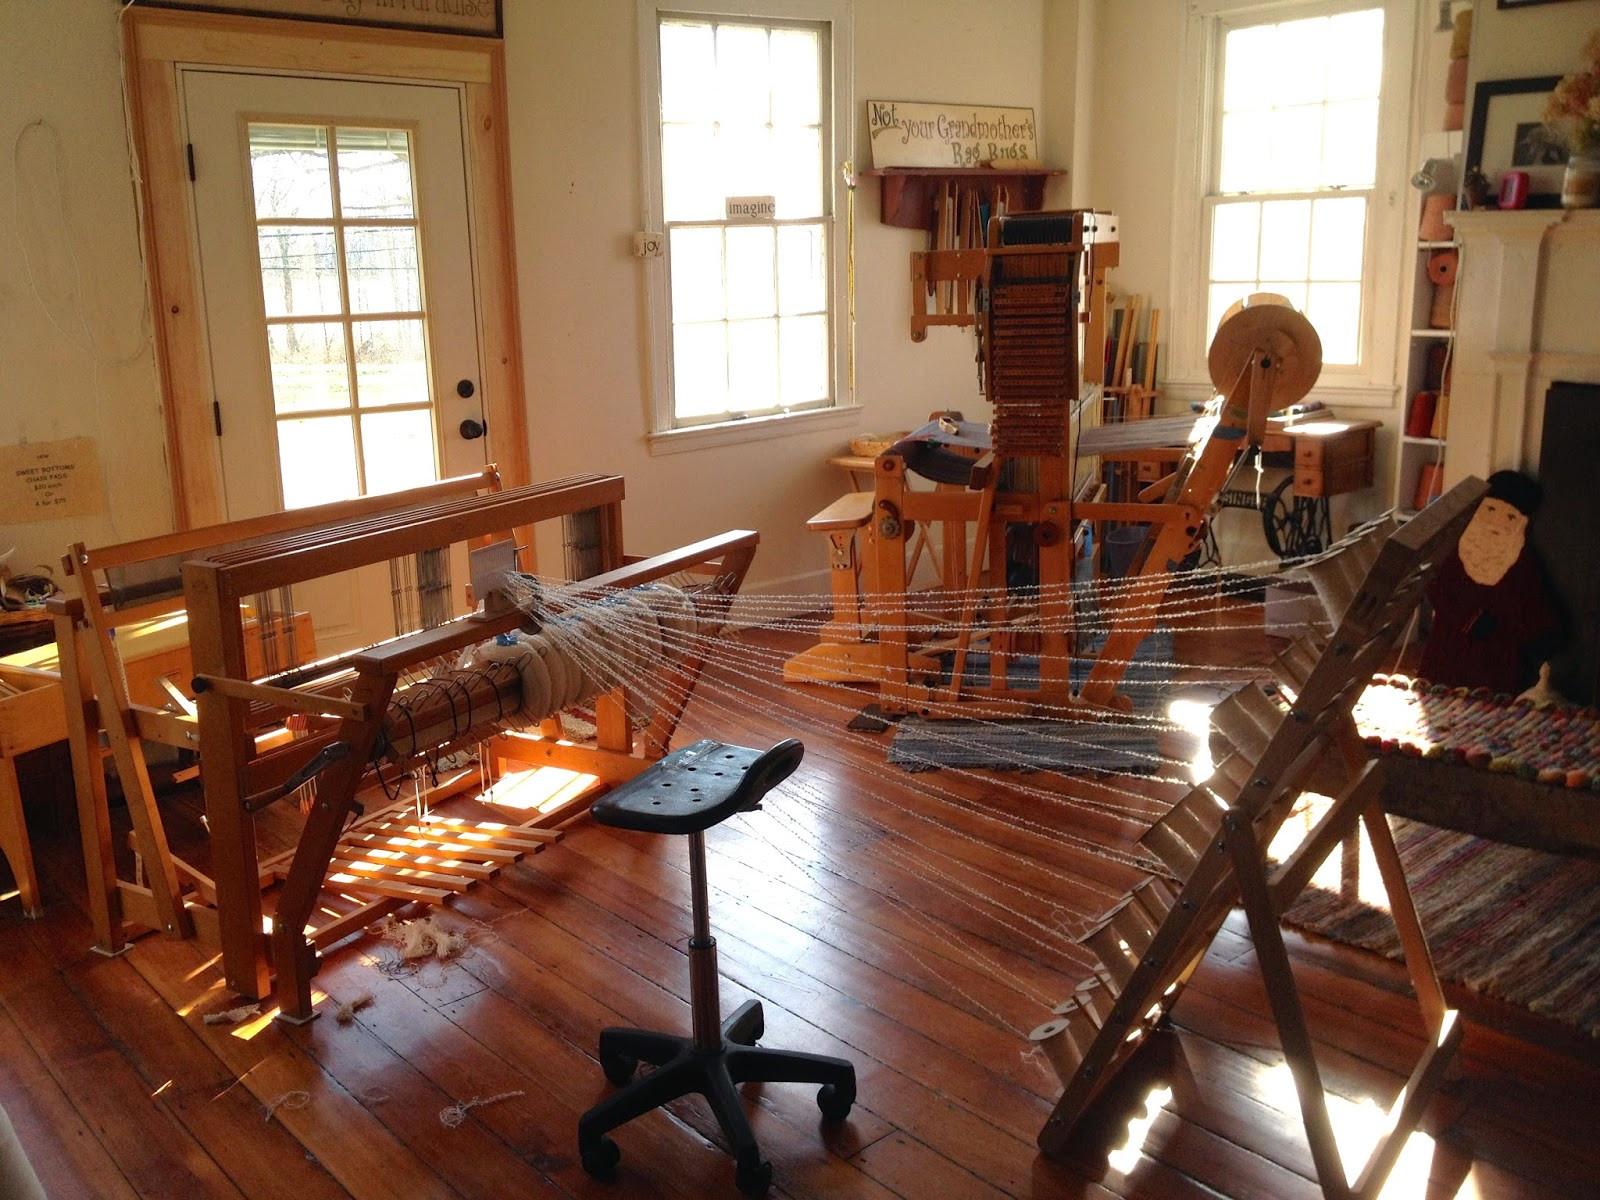 Craigslist Thanksgiving Dinner  Crazy as a Loom Happy Thanksgiving